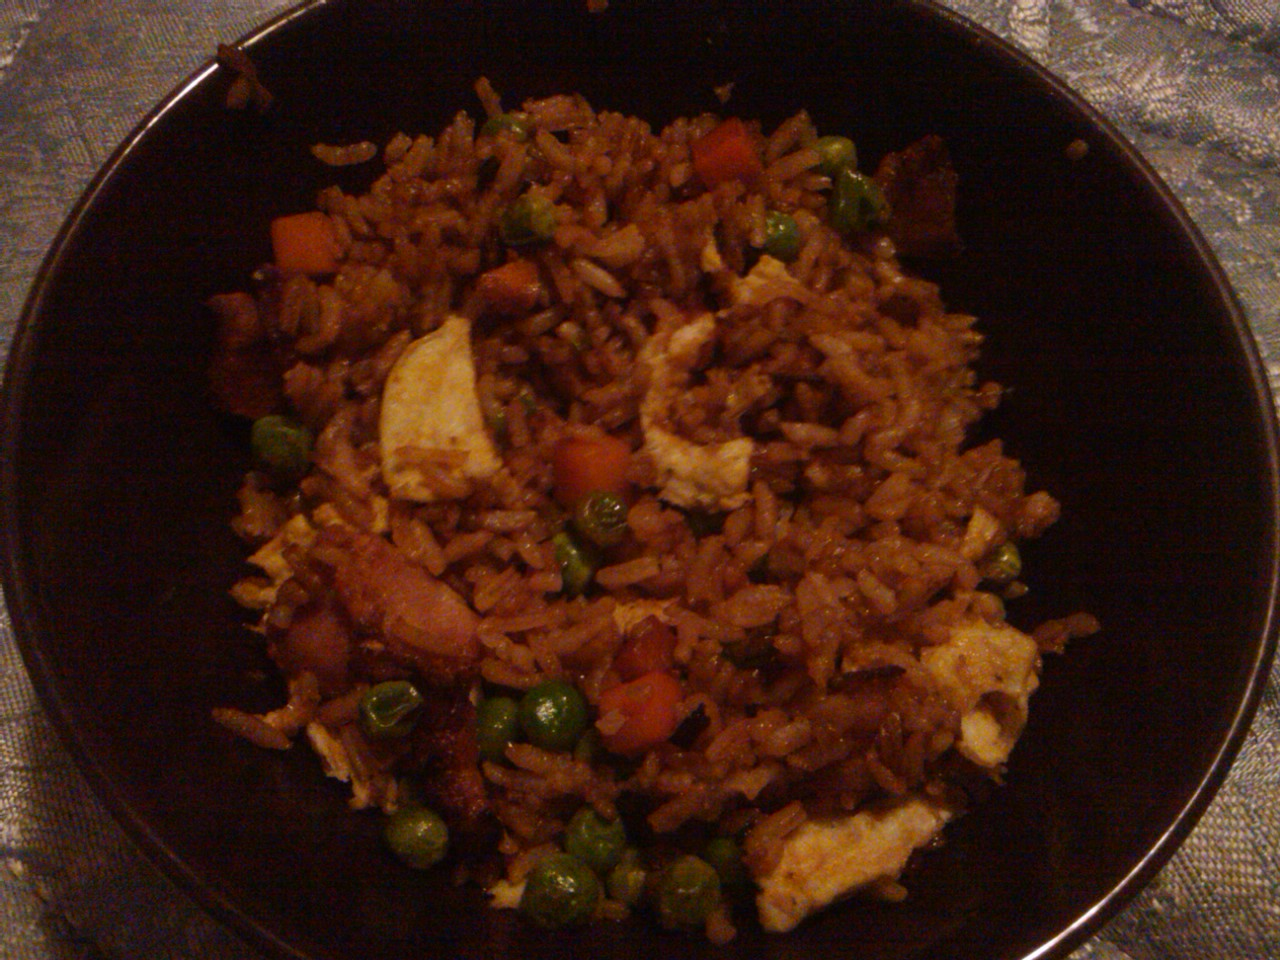 vancouver, wa :: homemade fried rice. eggs bacon peas carrots green onions